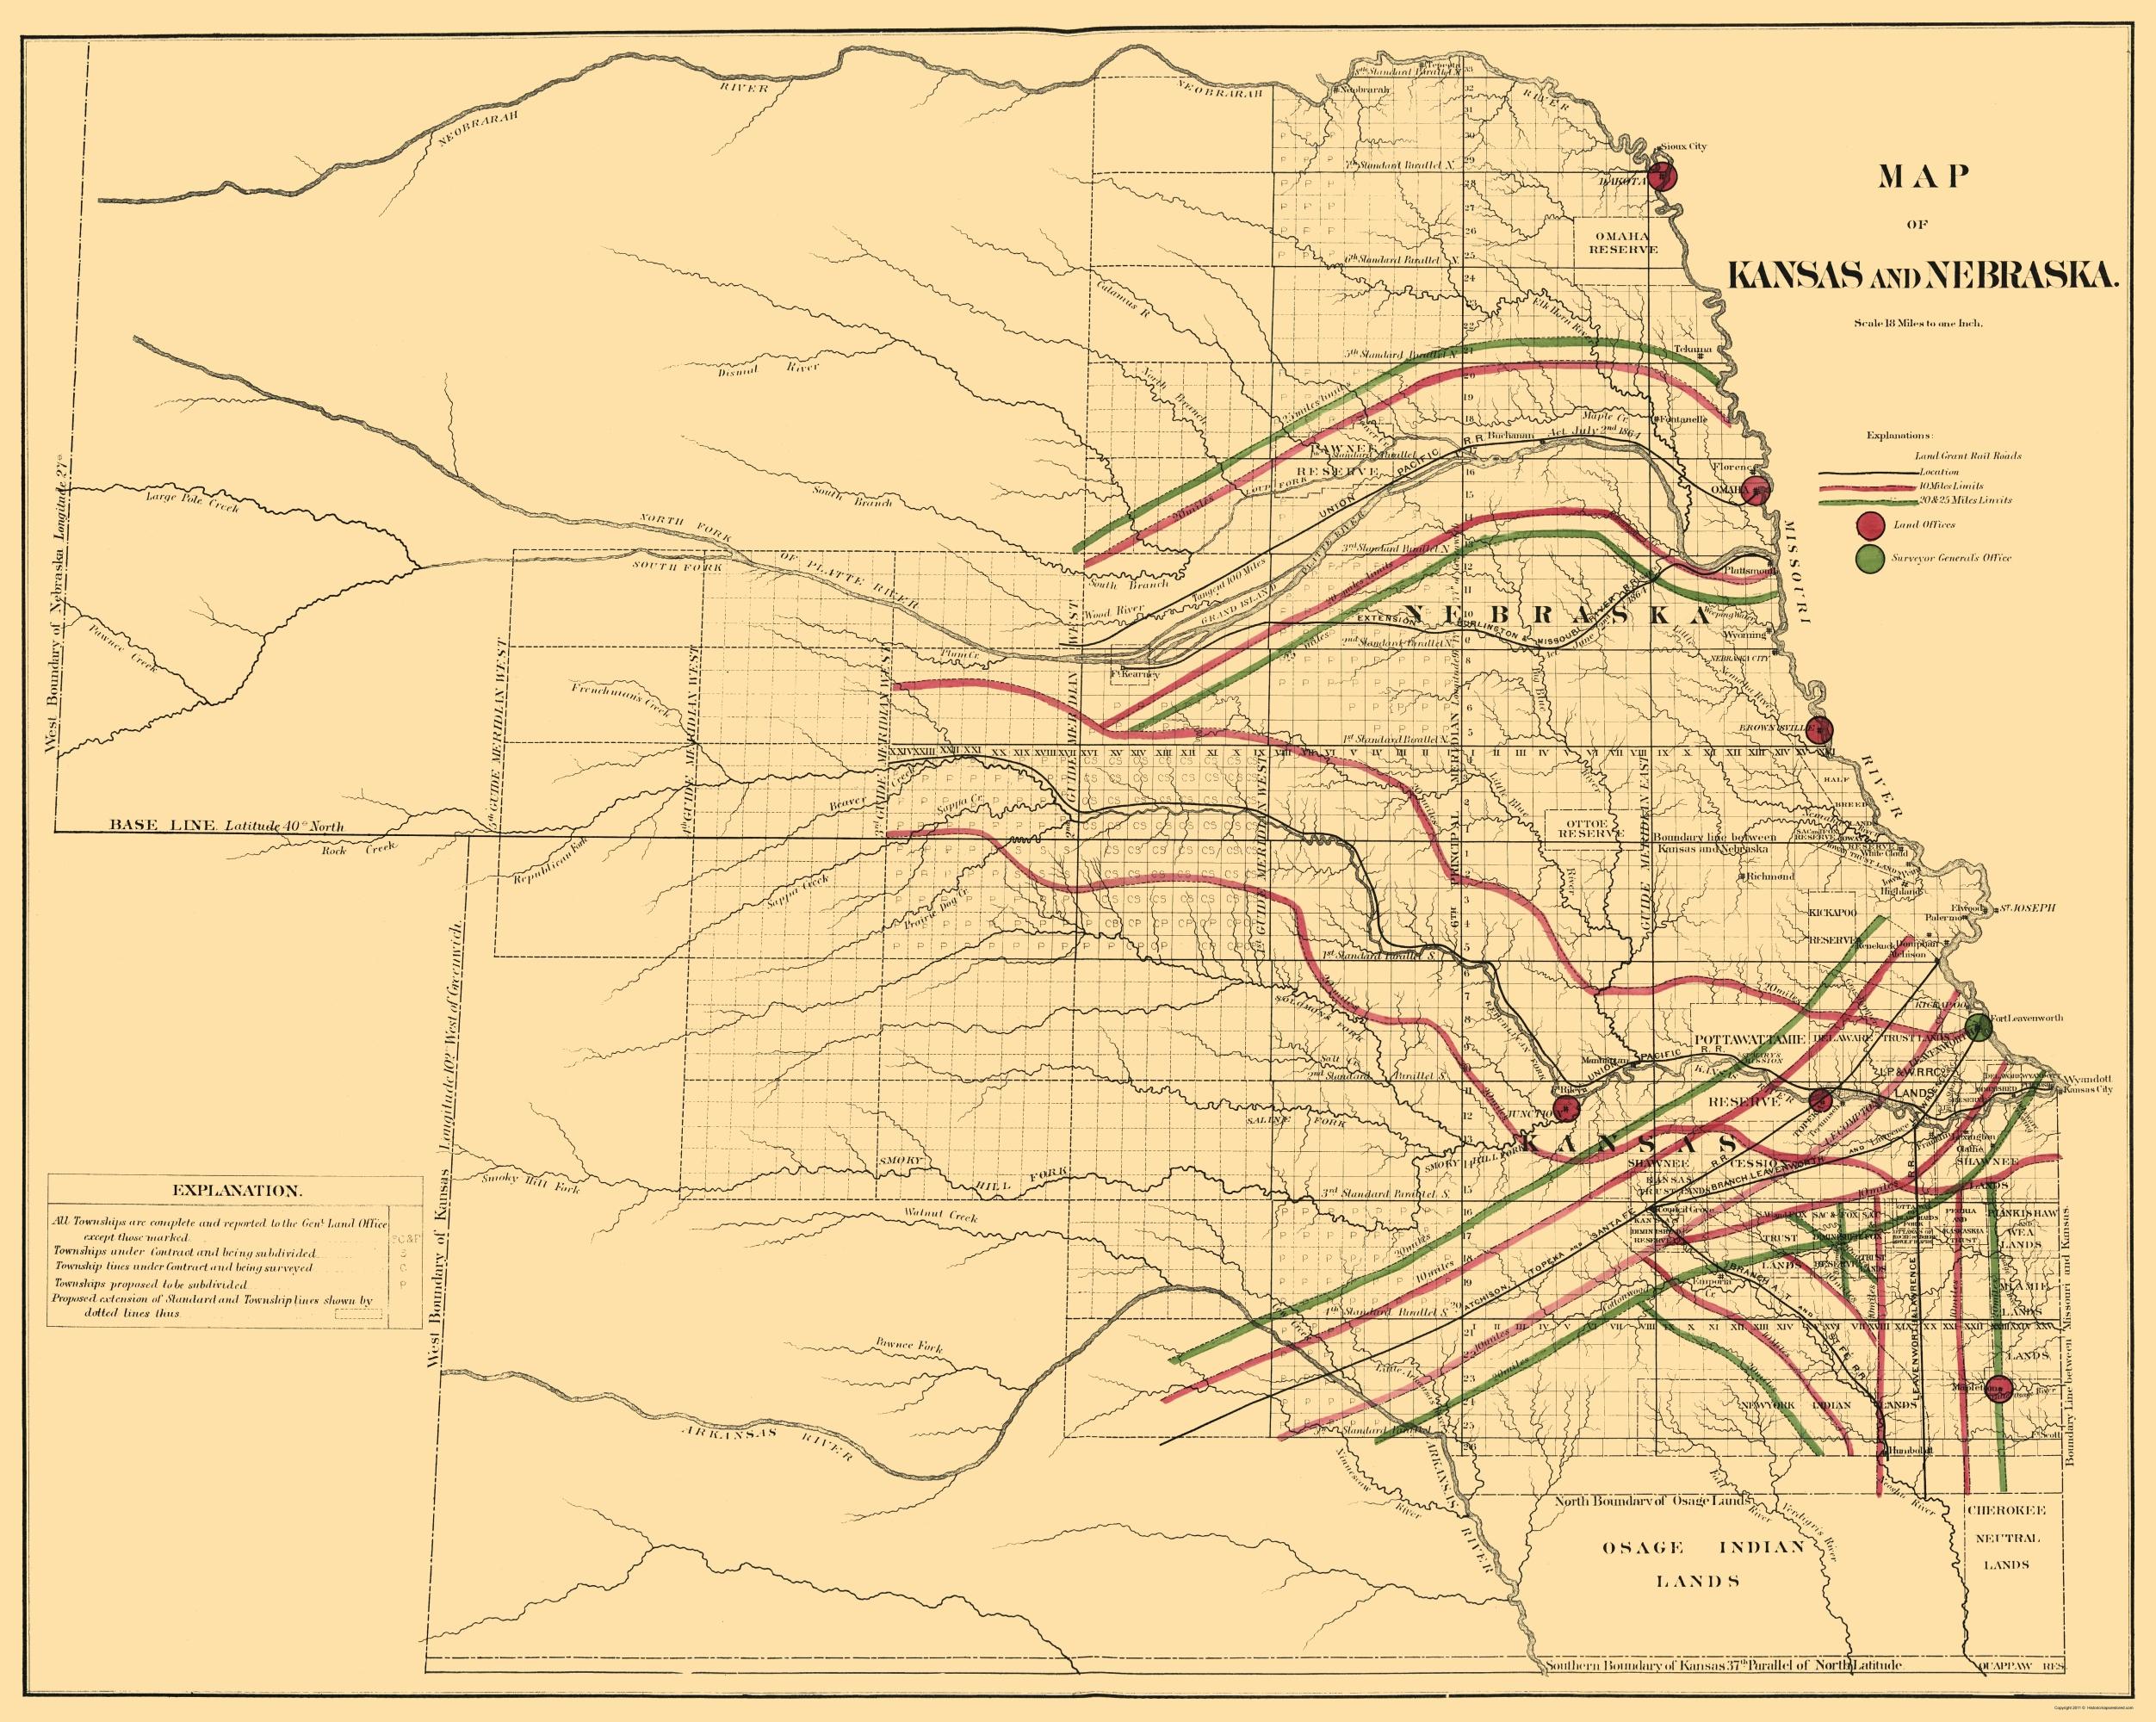 Old Nebraska Railroad Maps Maps Of The Past - Us railroad map 1880